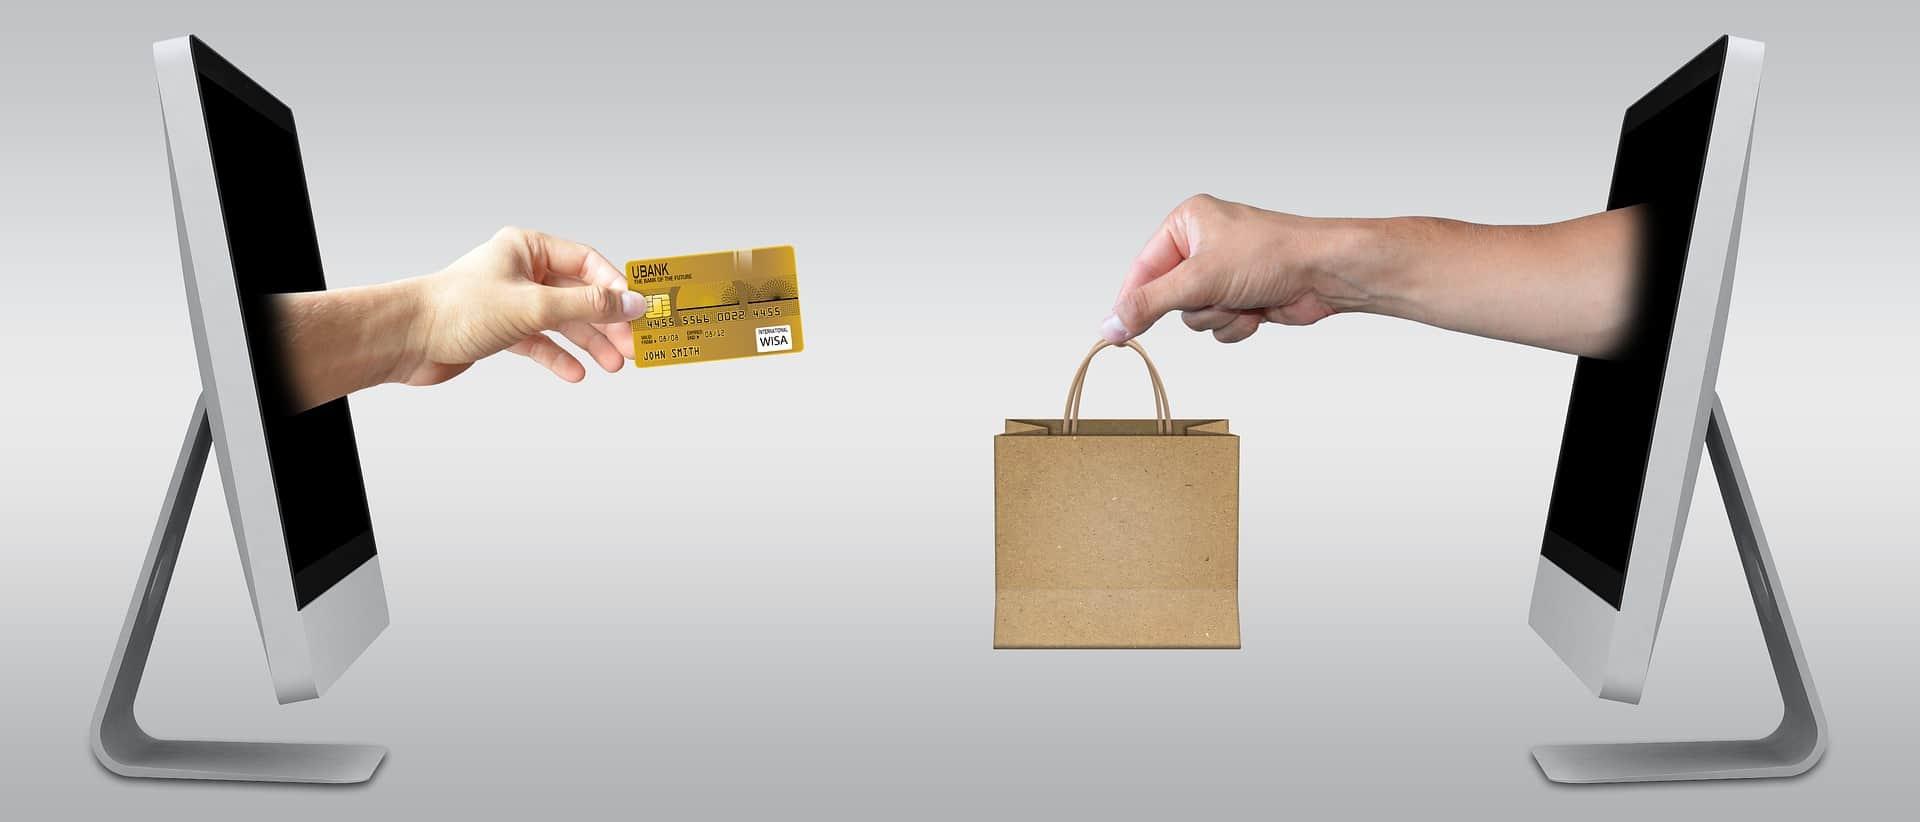 60% de quem compra online quer retirar na loja física